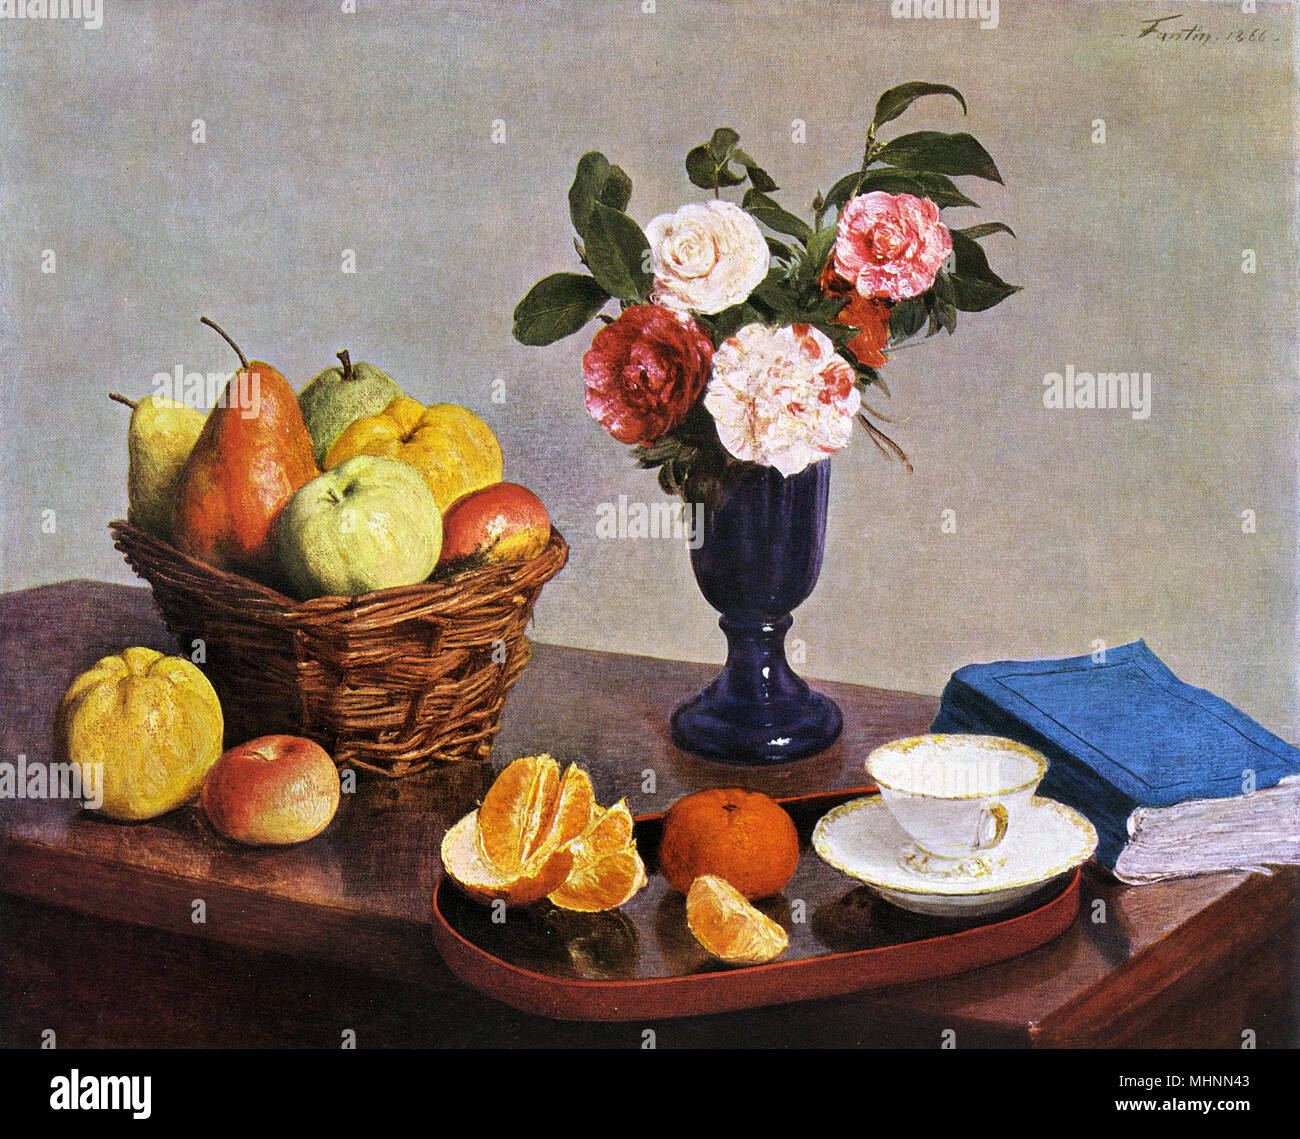 Still Life par Henri Fantin-Latour (1836-1904) Date: vers 1866 Photo Stock